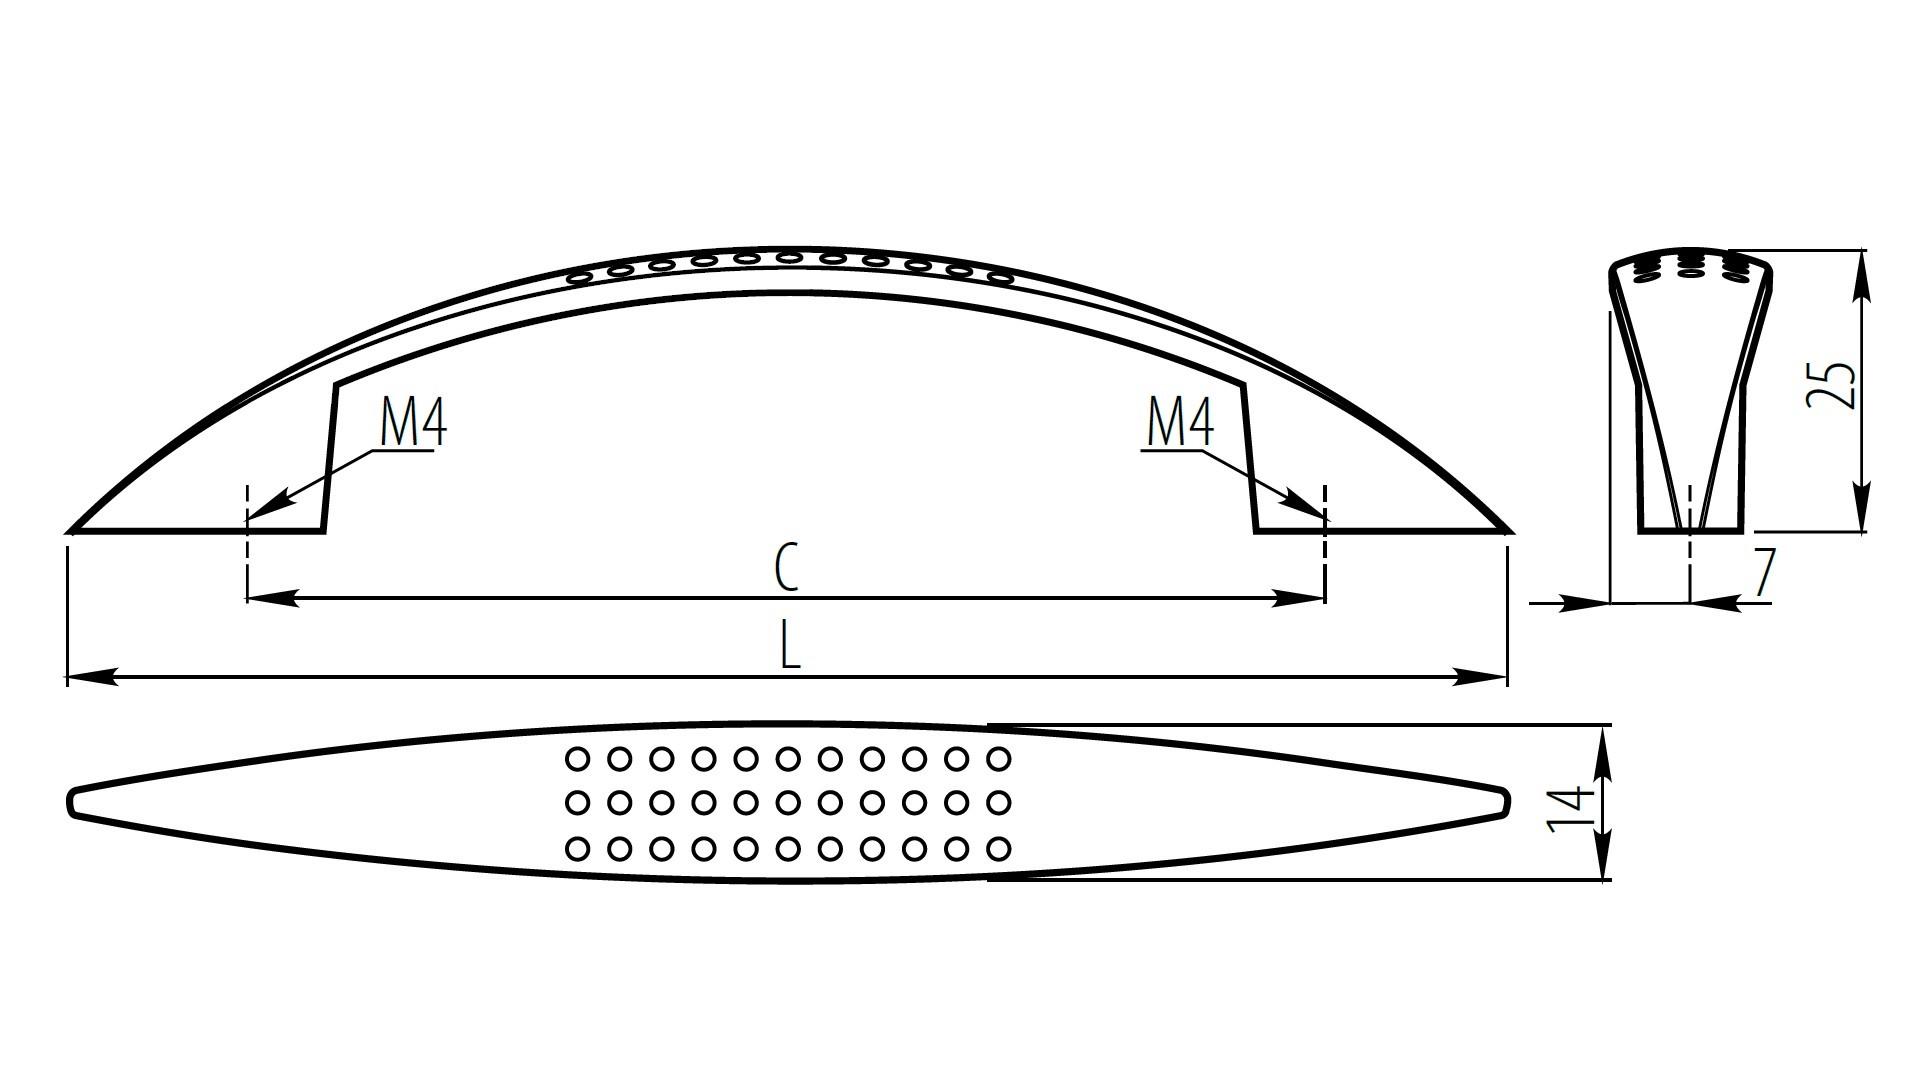 ROČAJ UZ-05 128 KROM